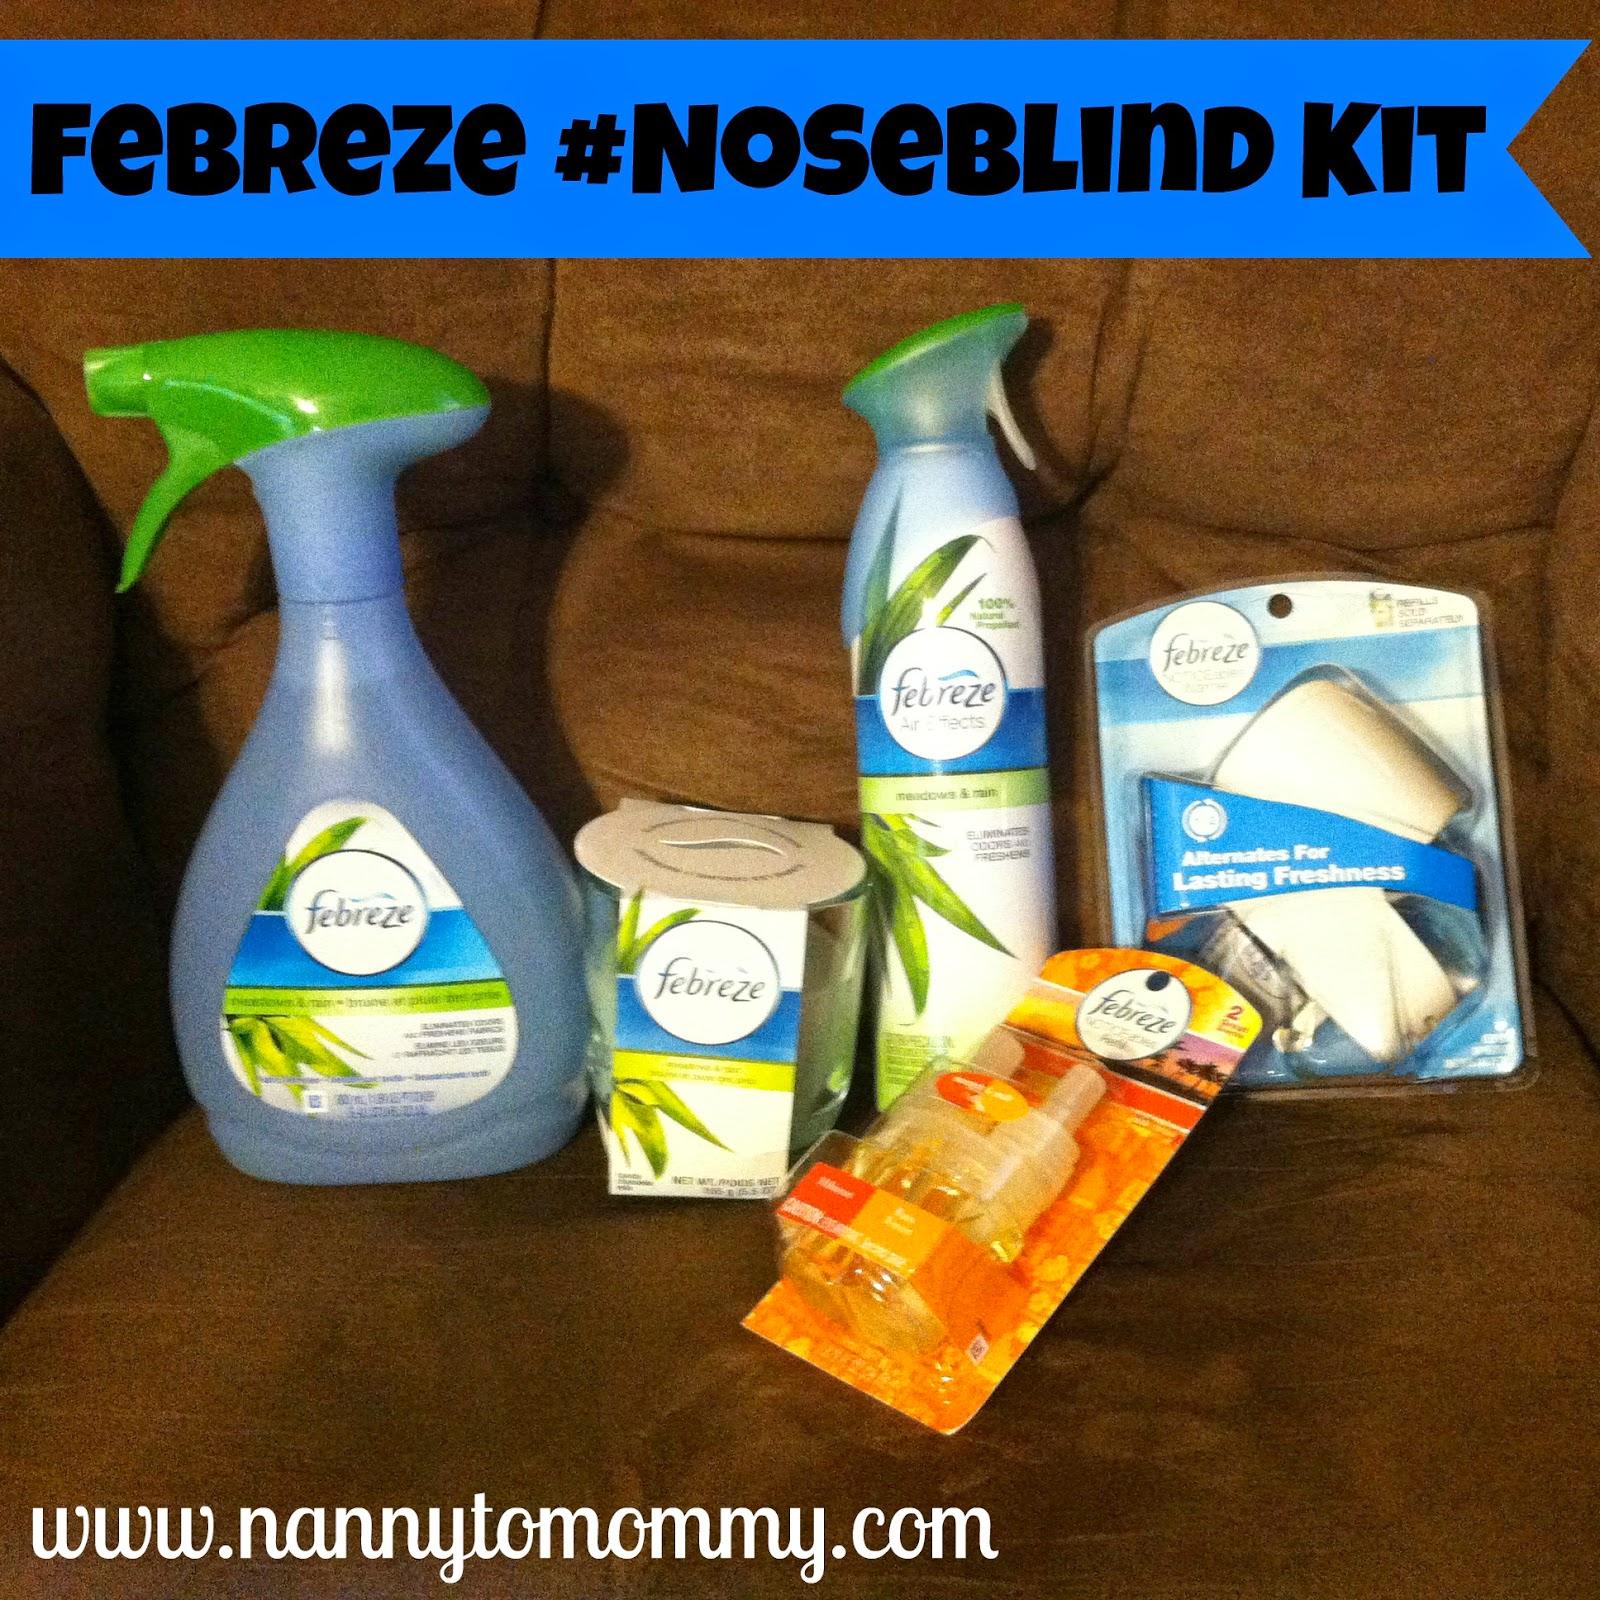 Febreze #Noseblind Kit